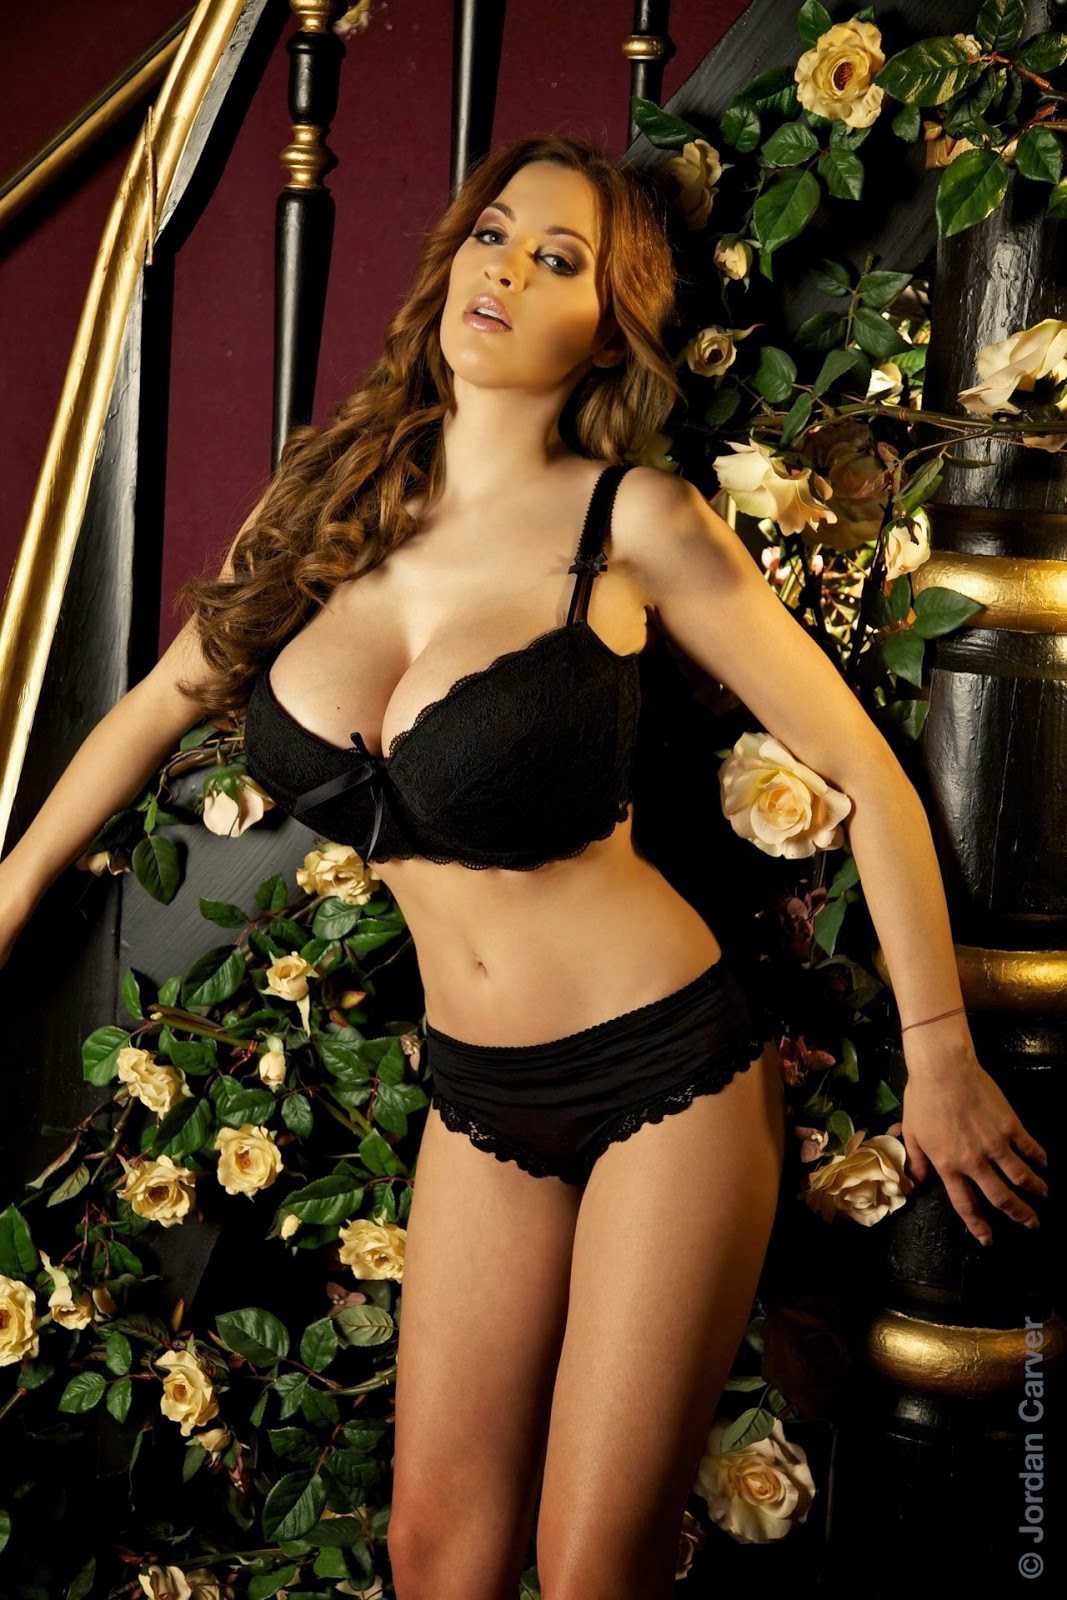 Jordan Carver Big Boobs In Black Bra And Panty Giuliette -4260